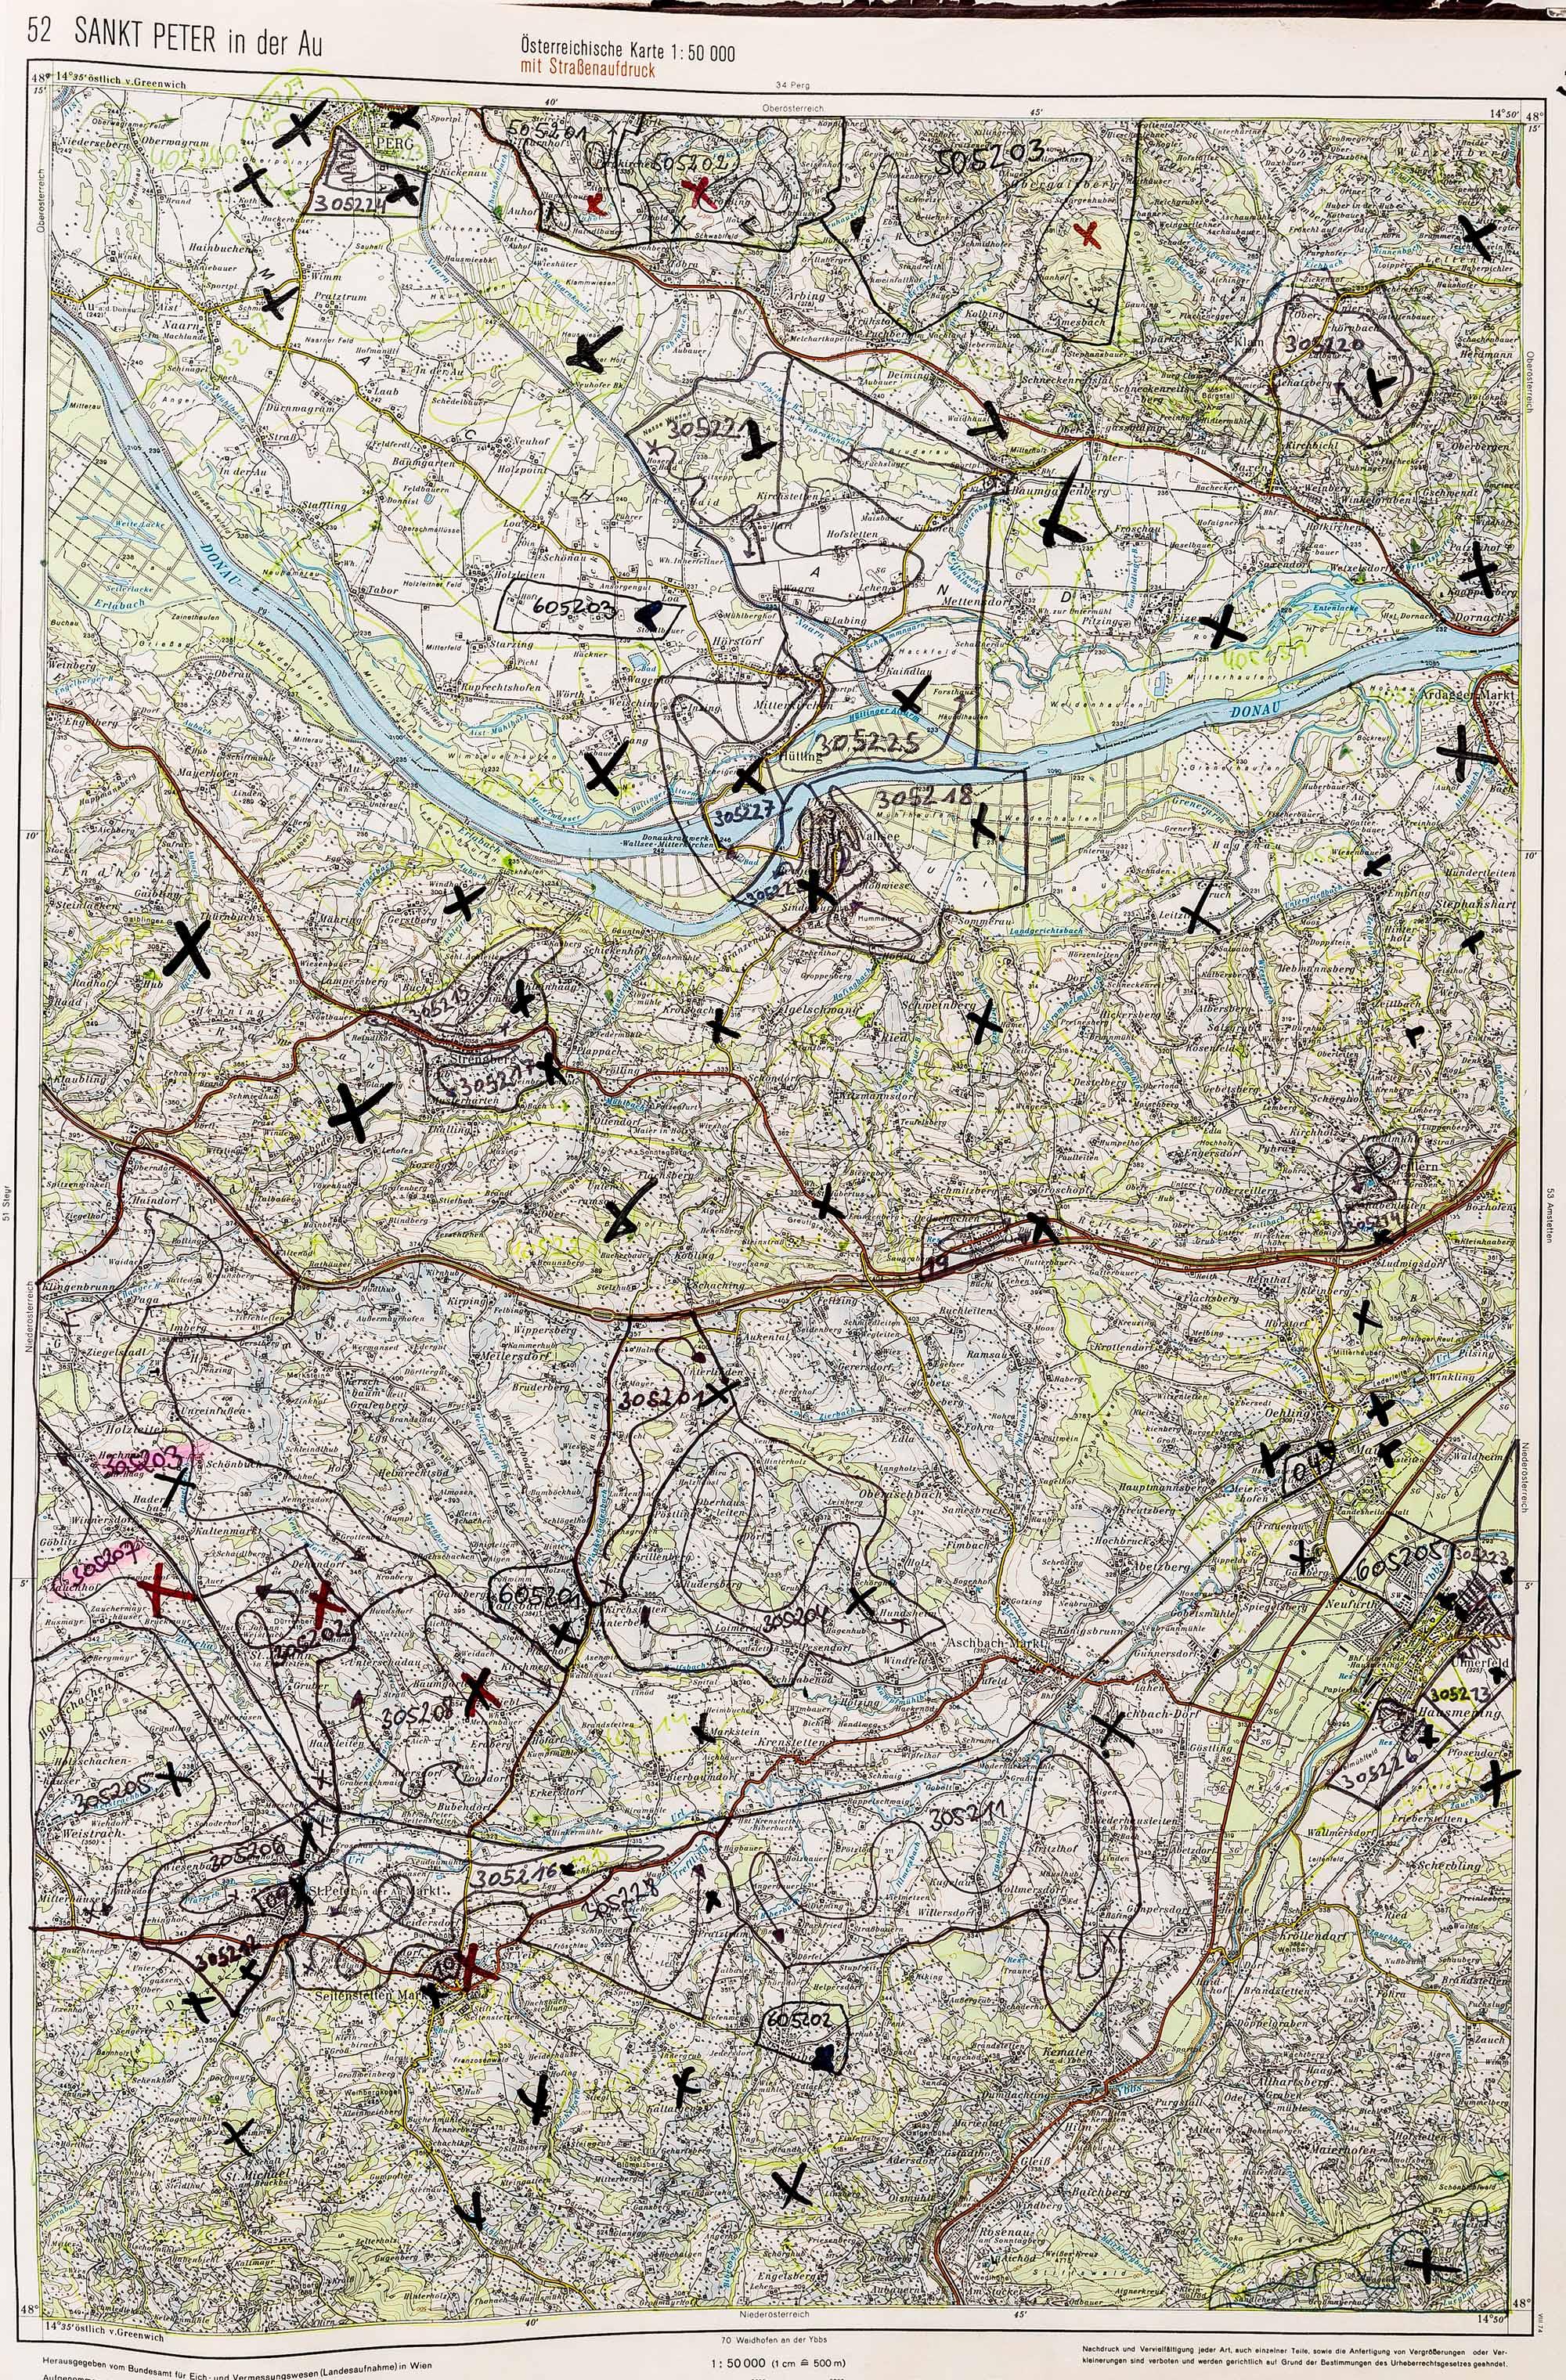 1983-1986 Karte 052